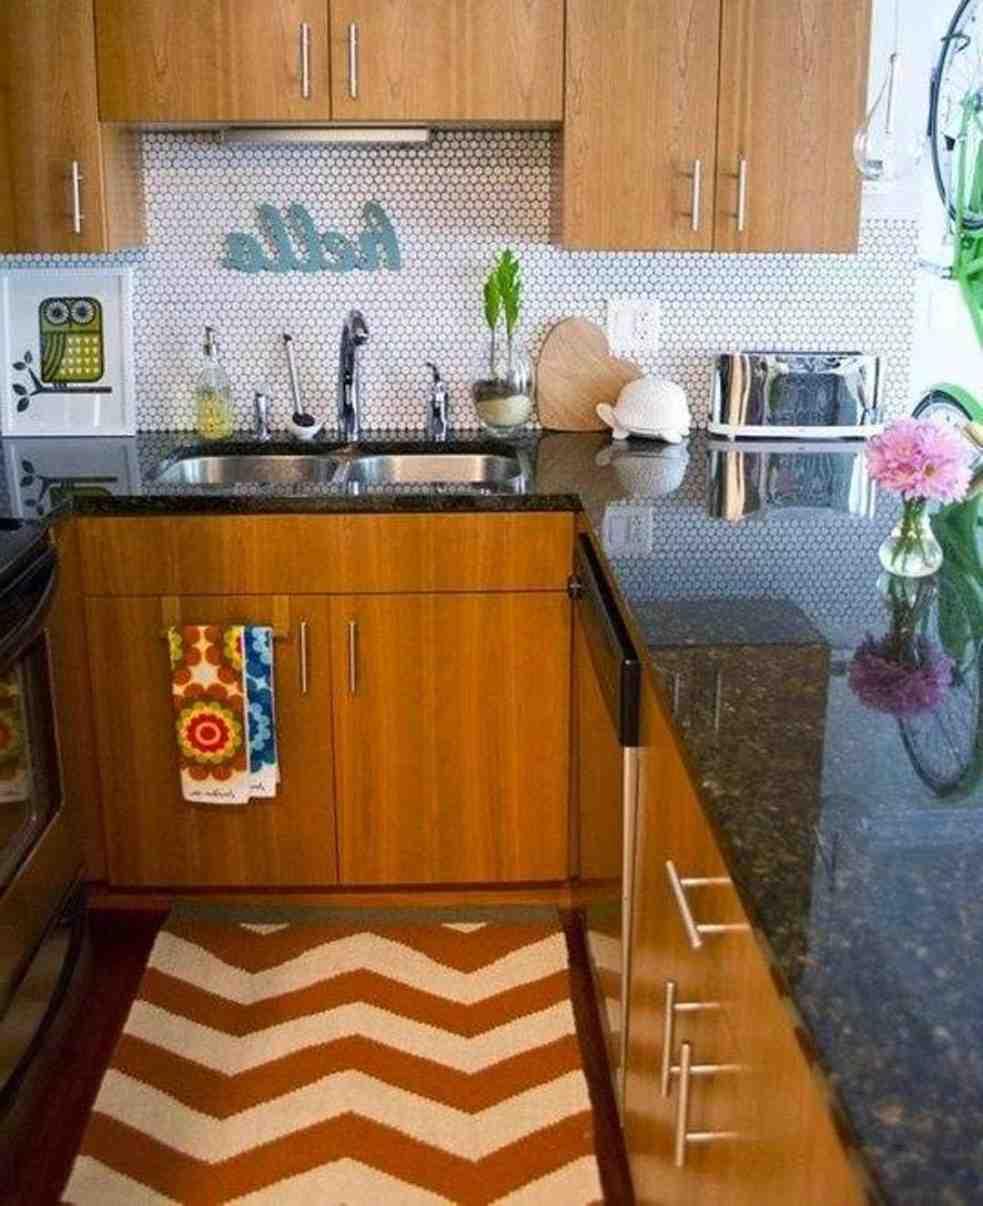 Apartment Kitchen Decorating Ideas: Small Apartment Kitchen Decorating Ideas